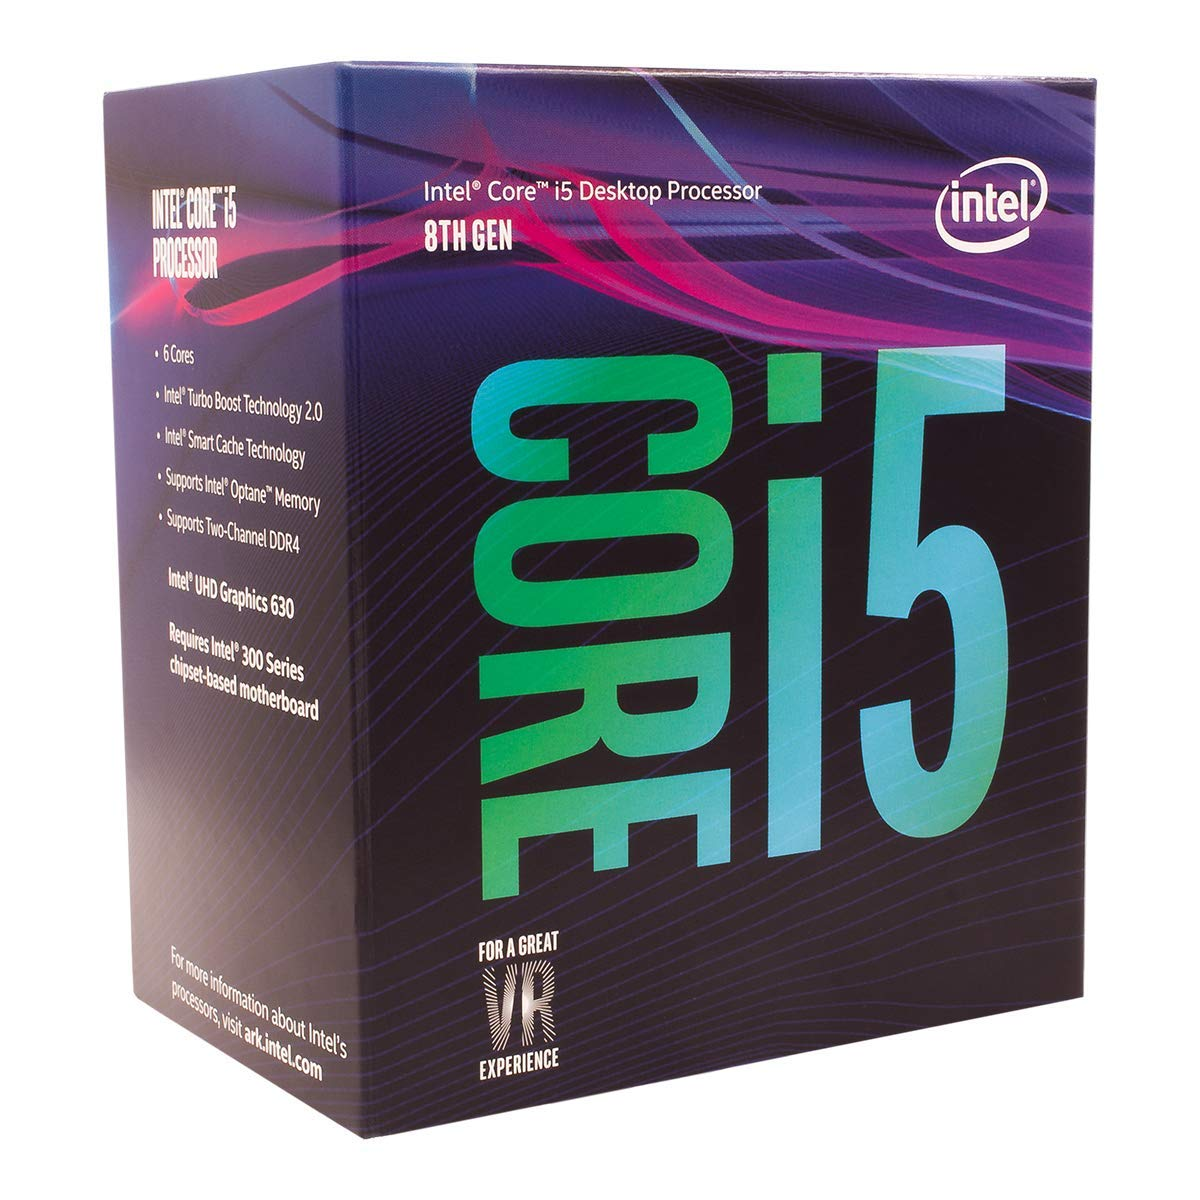 CPU INTEL CORE™ i5 8400 TH GEN 2.8 GHz 9MB CACHE SOK LGA 1151 TRAY بدون مروحه ,Desktop CPU